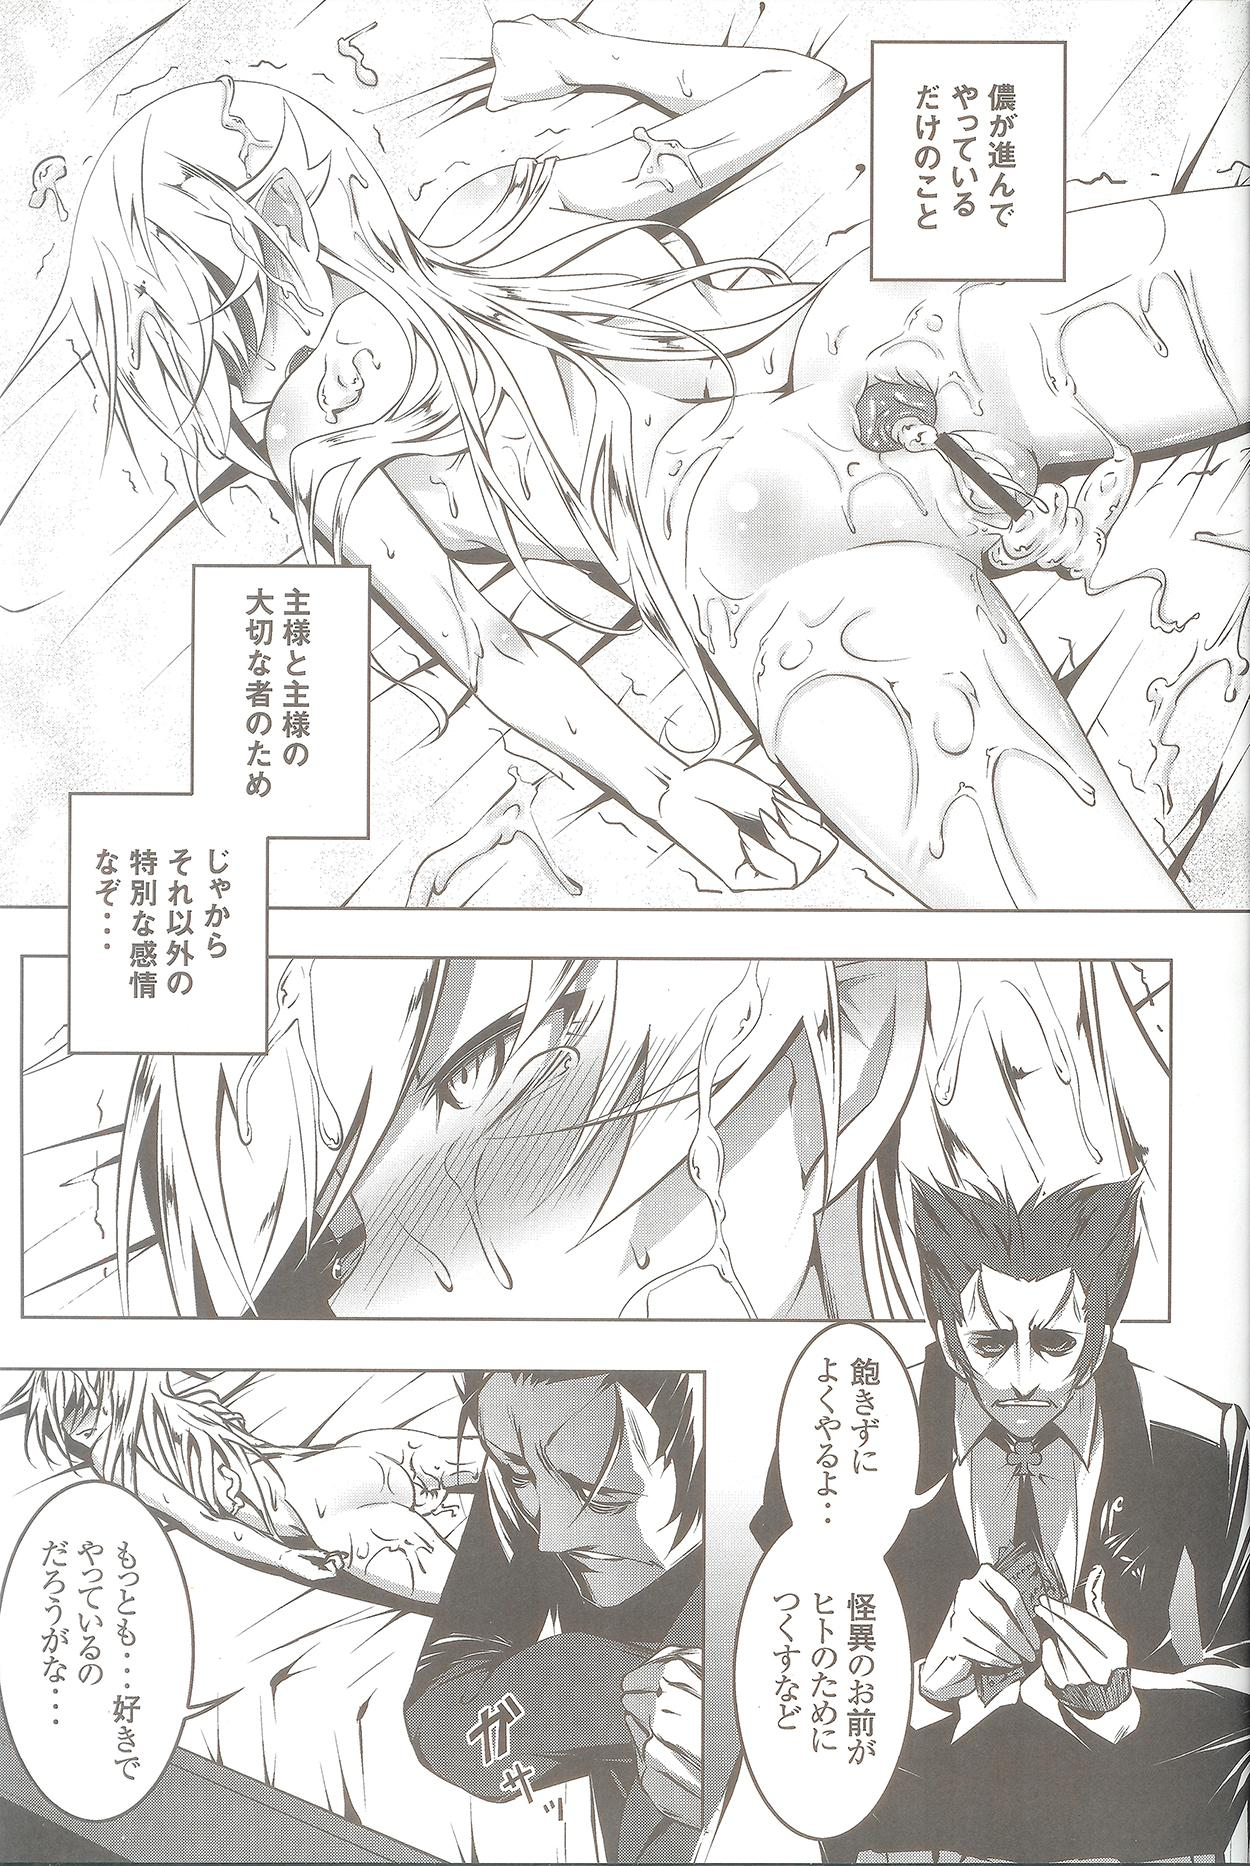 Netoraregatari San 2